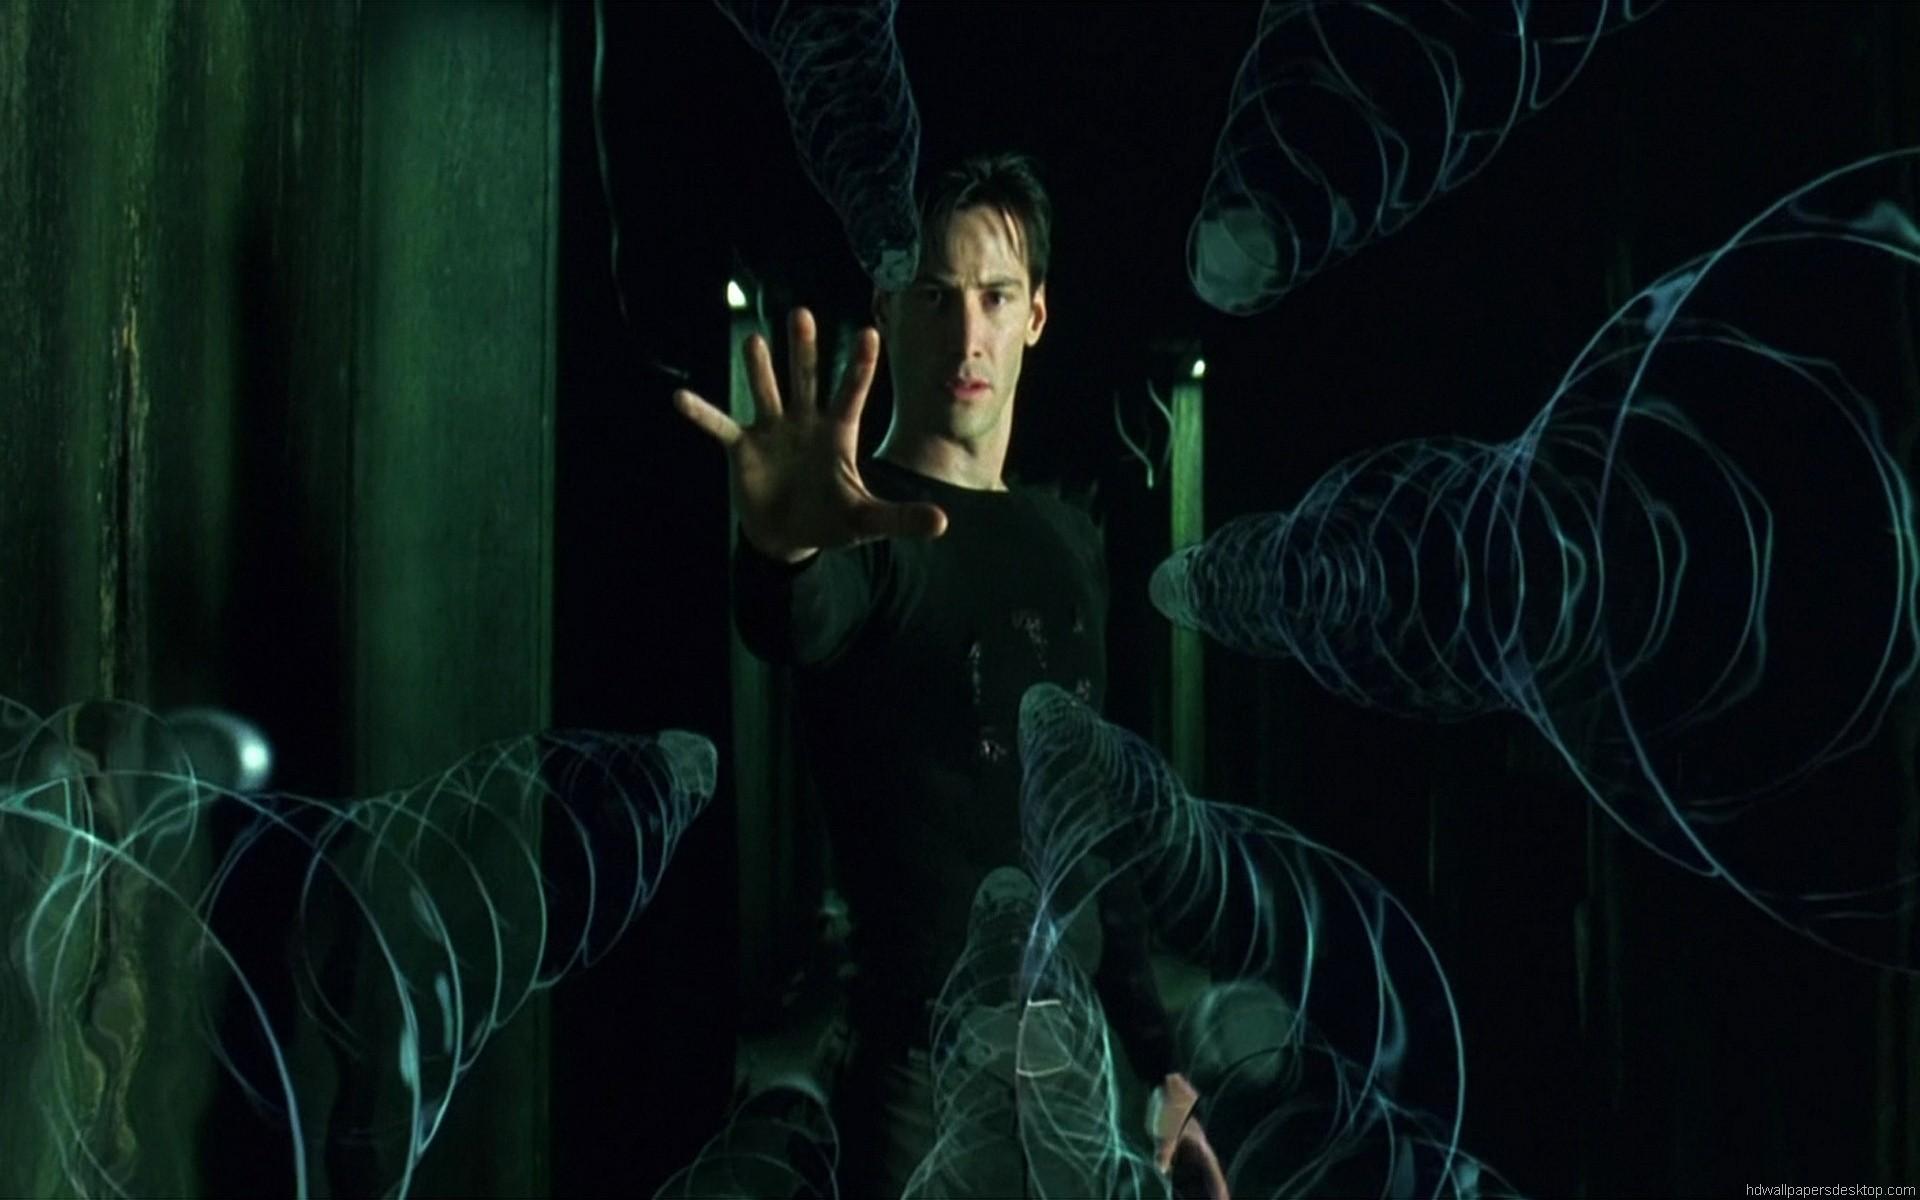 Wallpapers, Movie, The Matrix HD Wallpapers, The Matrix Wallpaper 5